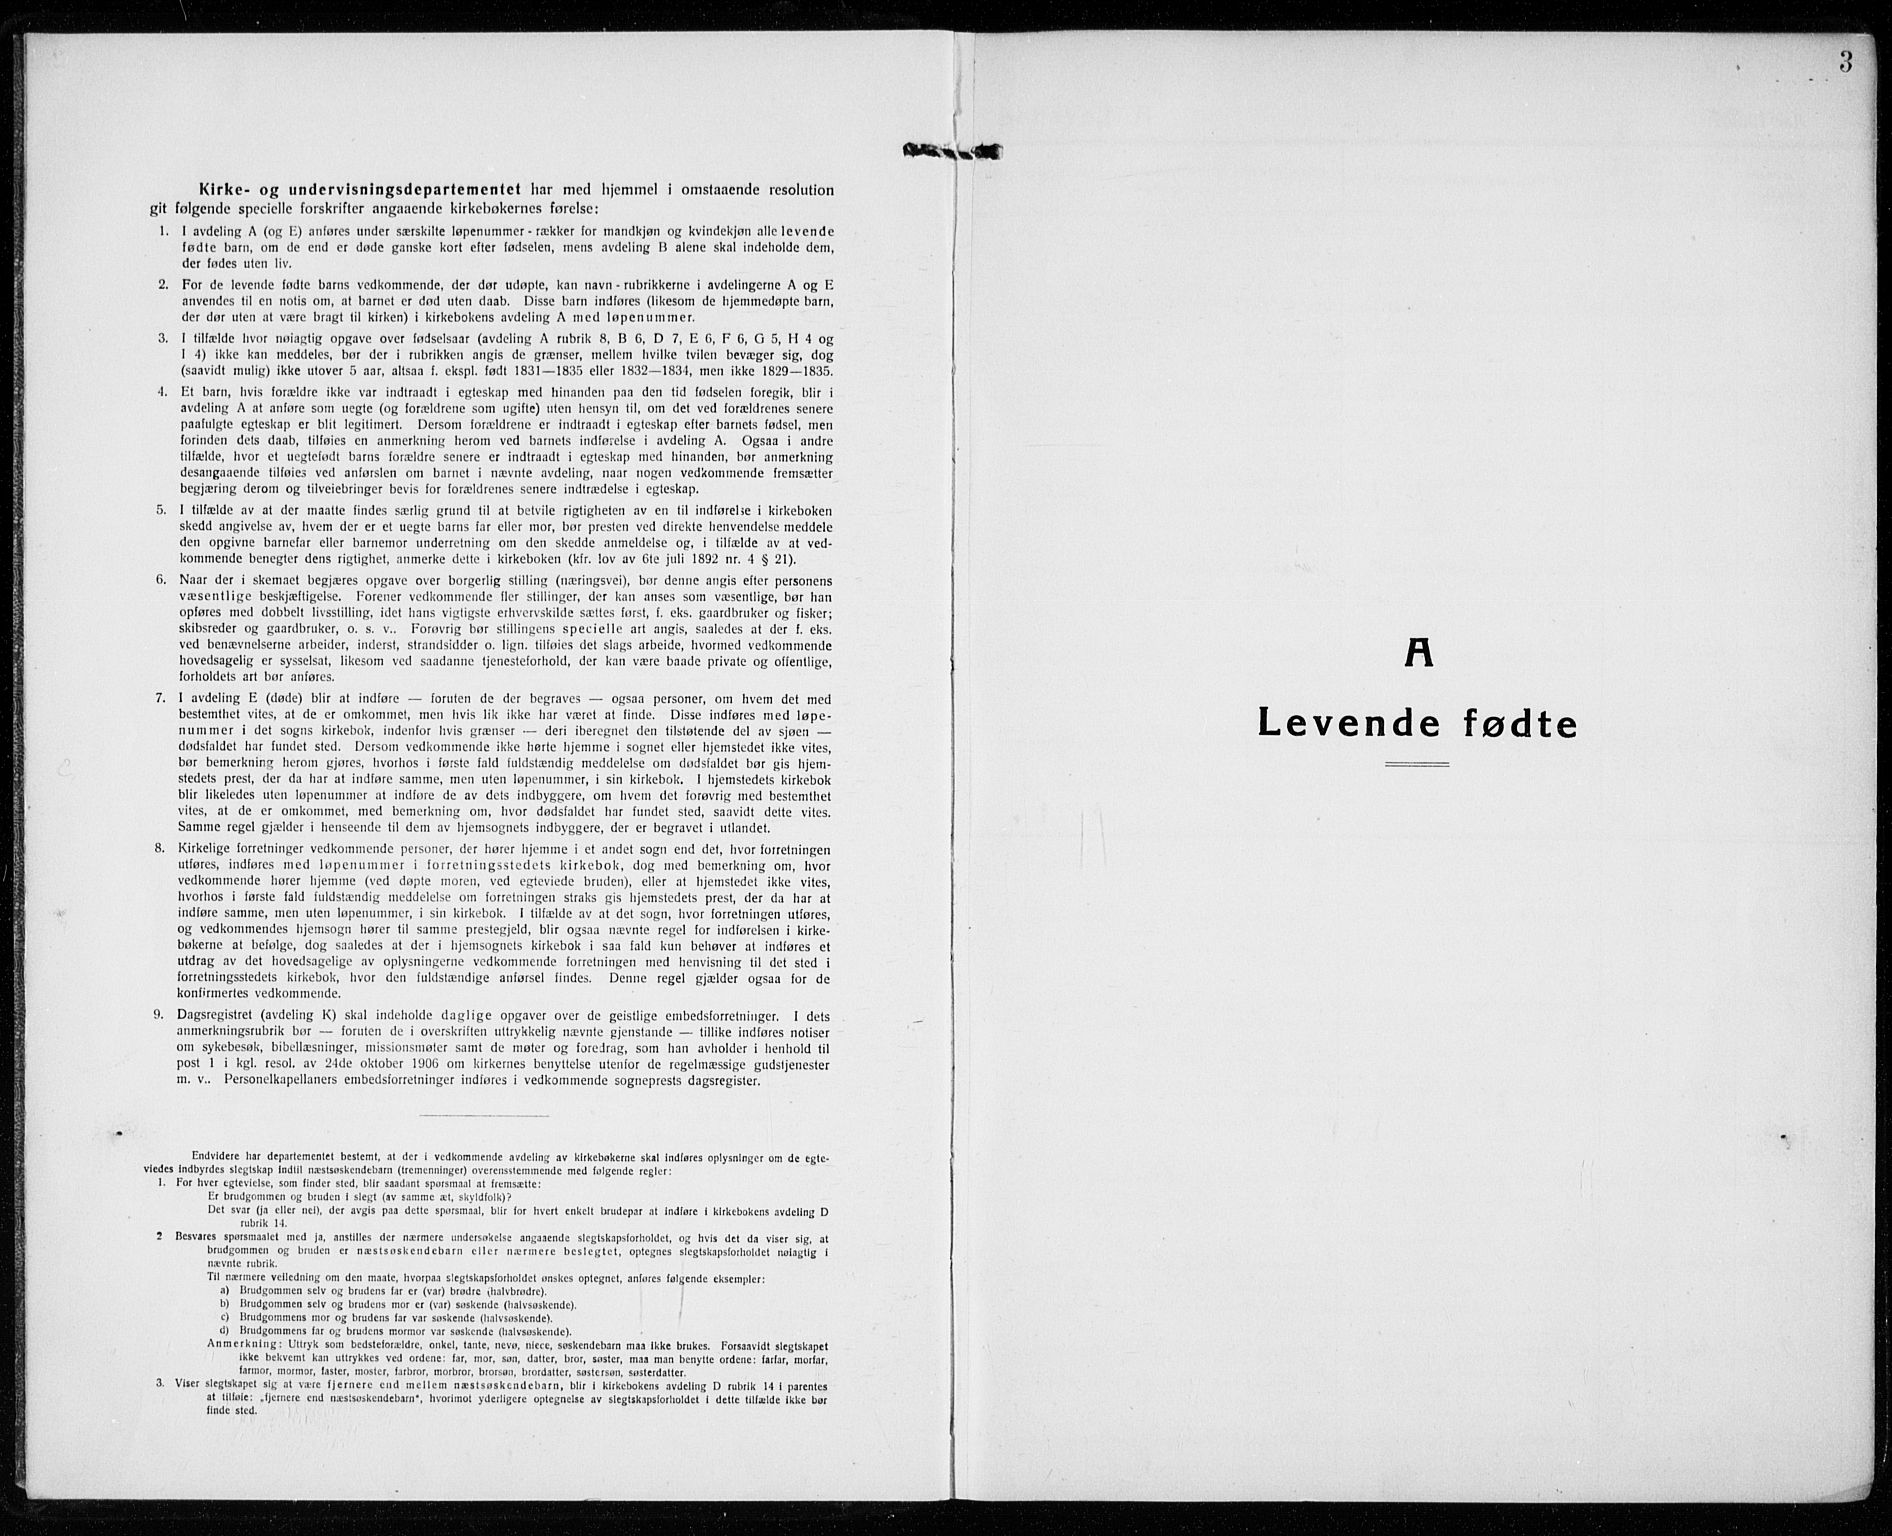 SAKO, Sandefjord kirkebøker, G/Ga/L0004: Klokkerbok nr. 4, 1920-1931, s. 3